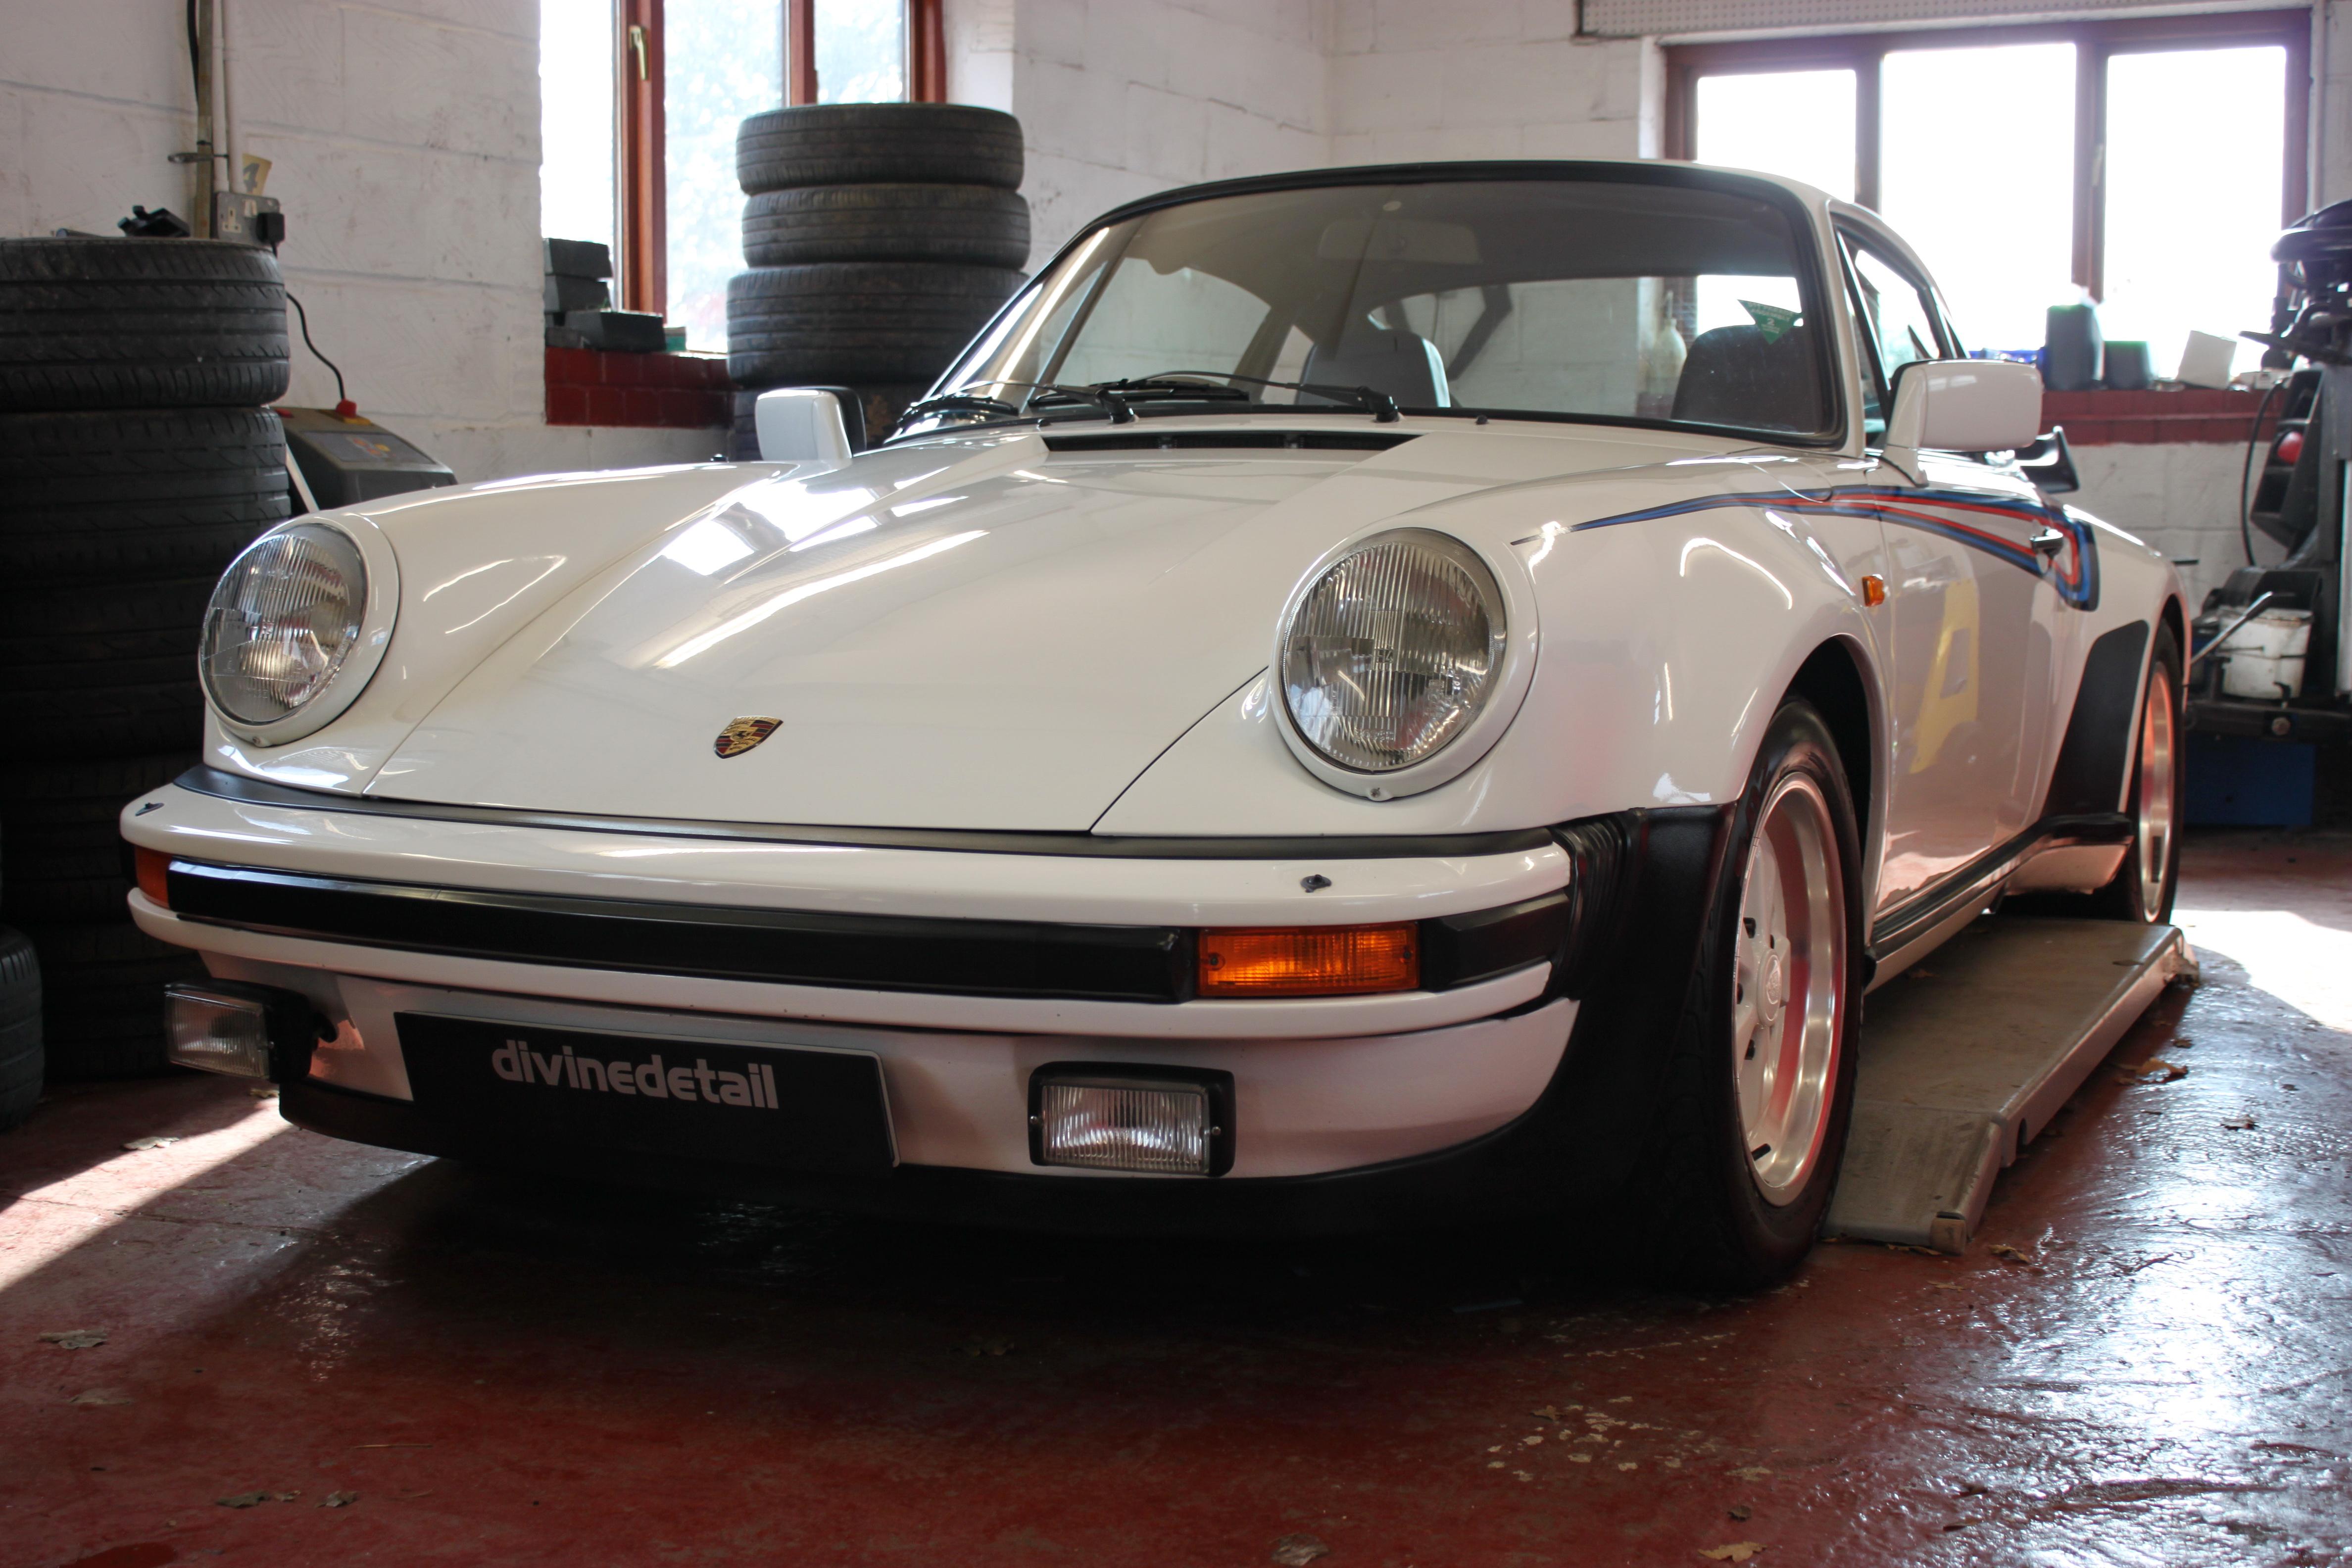 Porsche 930 Turbo detailed